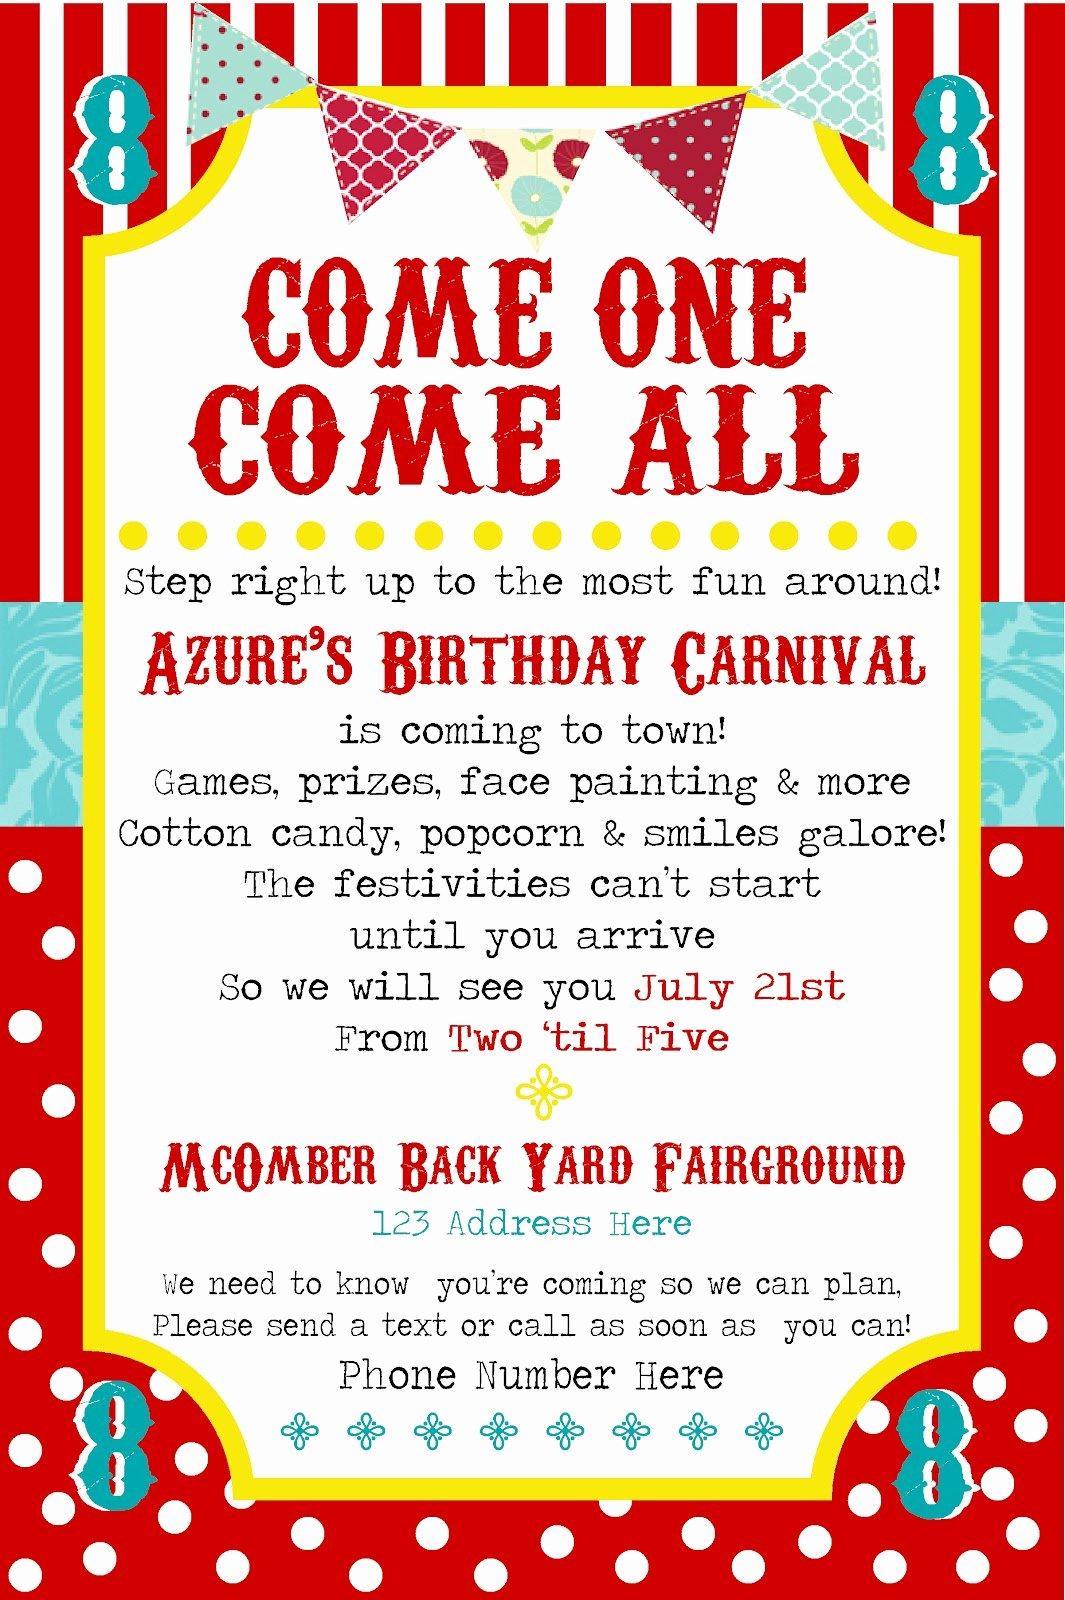 Carnival theme Party Invitations Elegant Simplycumorah July 2012